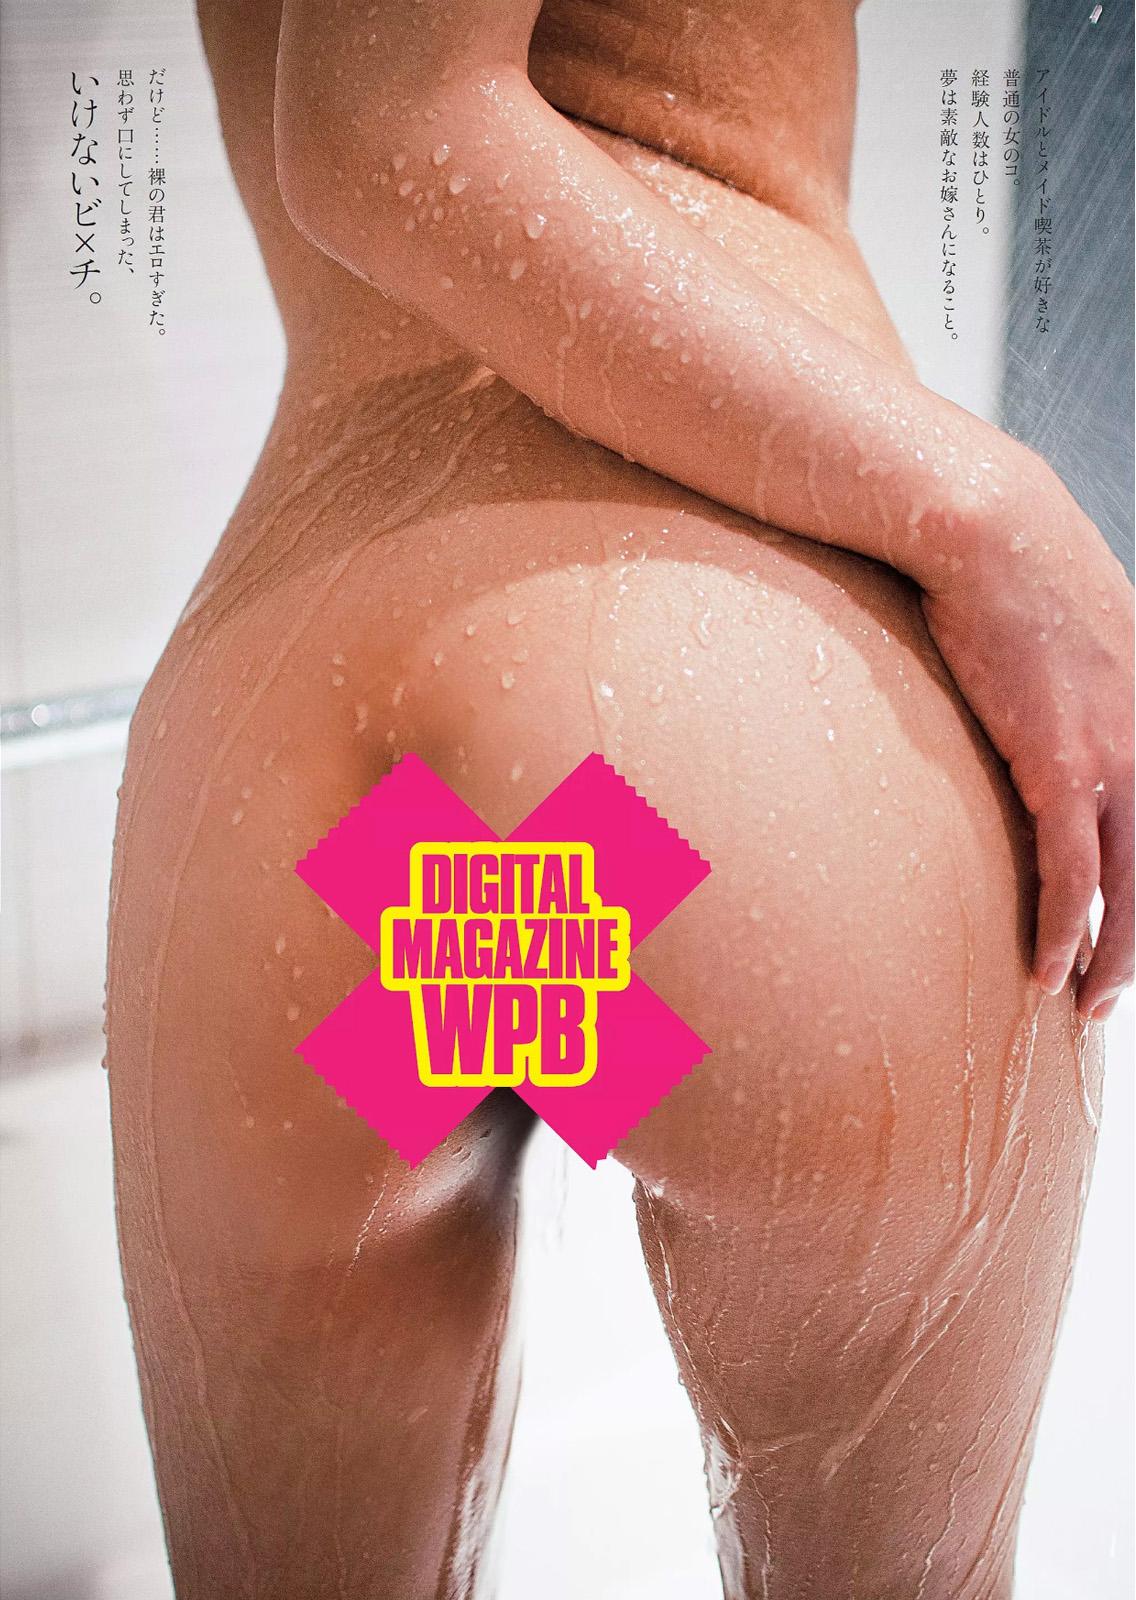 Kurii Mii 栗井みい, Shukan Playboy 2017 No.33 (週刊プレイボーイ 2017年33号)